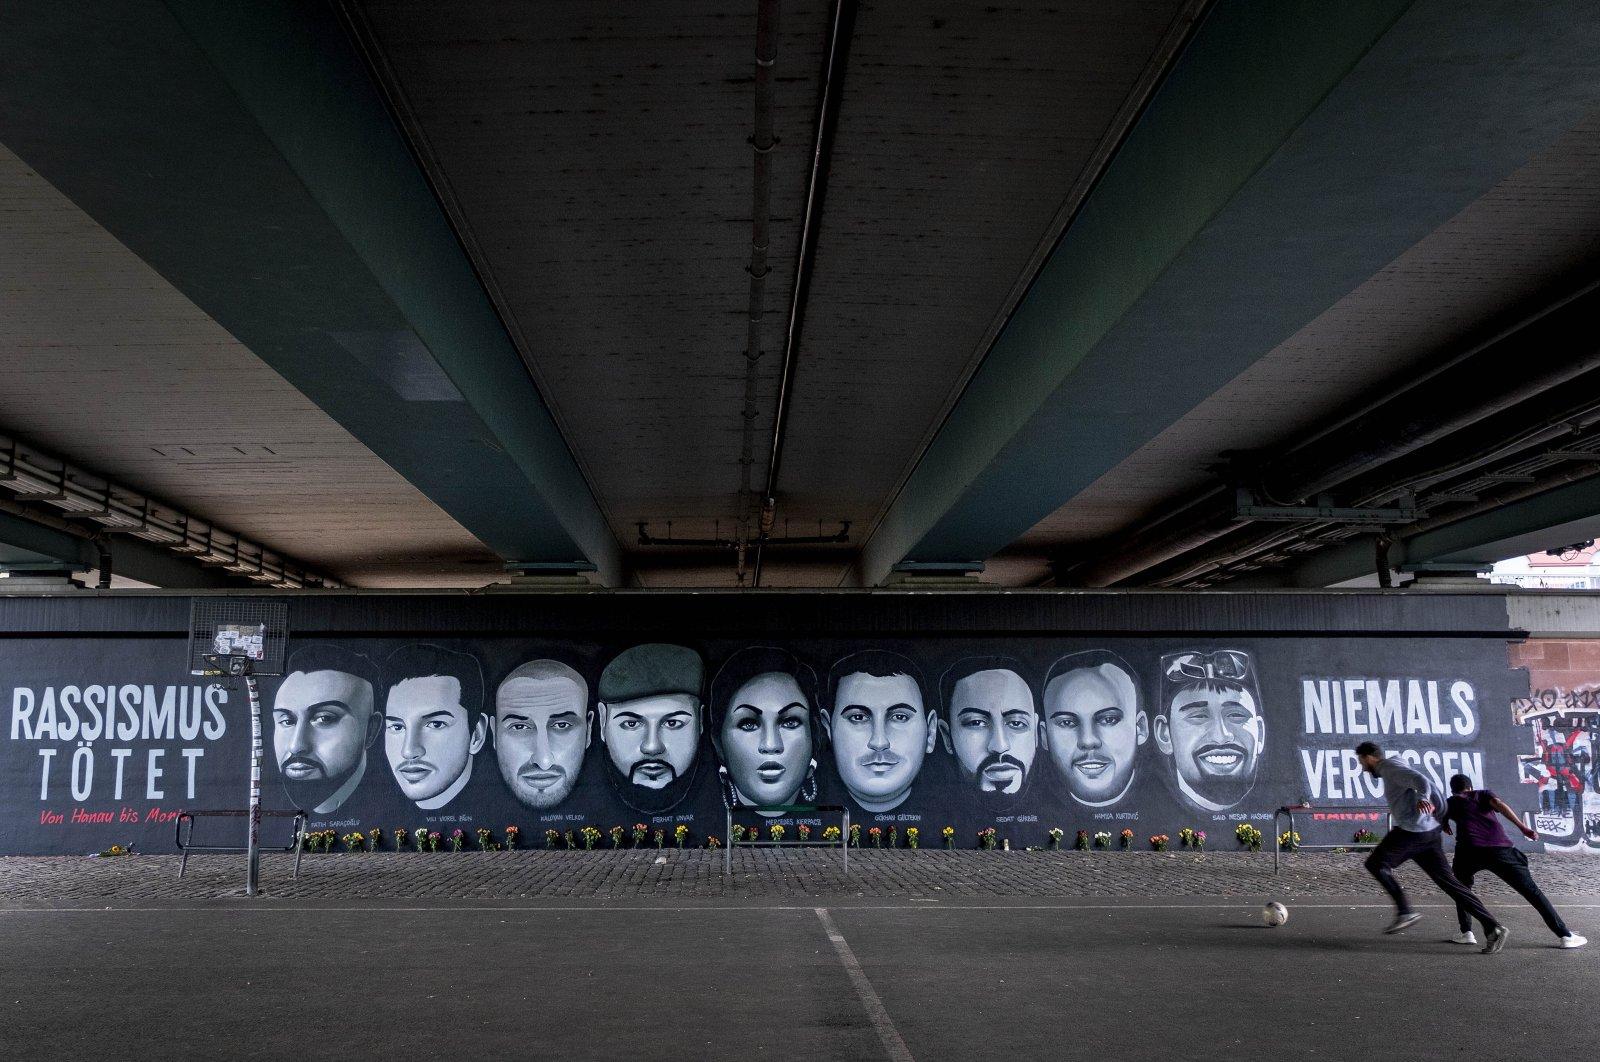 A boy and a man play football near graffiti depicting the nine victims of the Hanau shooting, under a bridge in Frankfurt am Main, Germany, June 20, 2020. (AP Photo)